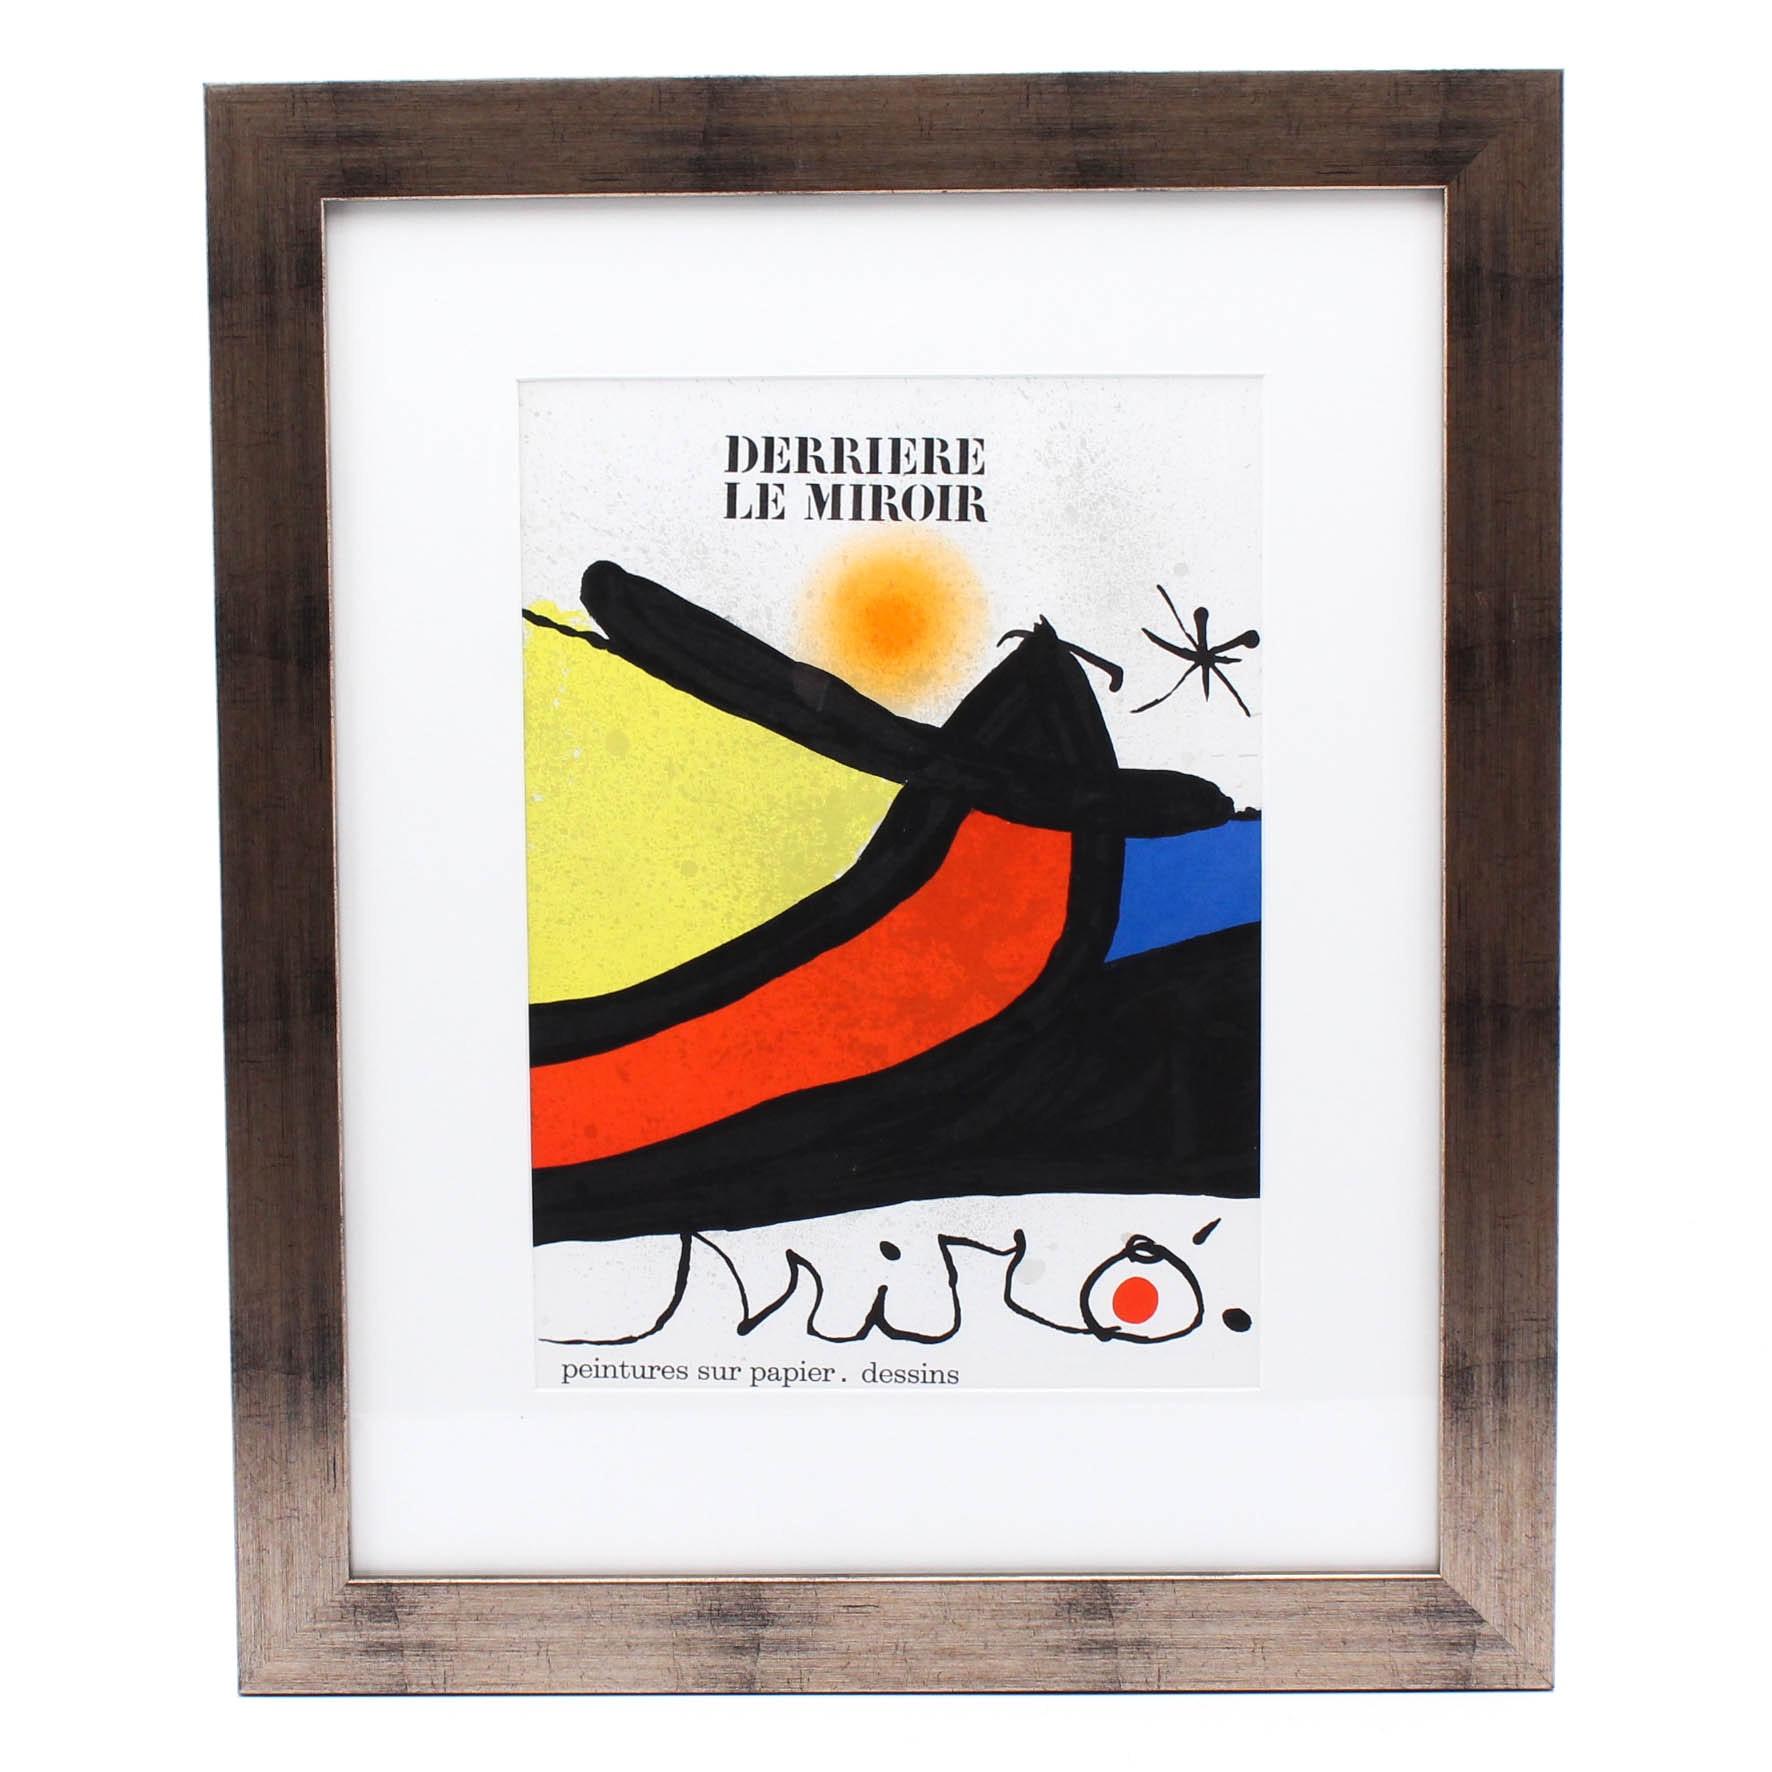 "Joan Miro Color Lithograph Cover for ""Derriere le Miroir"""